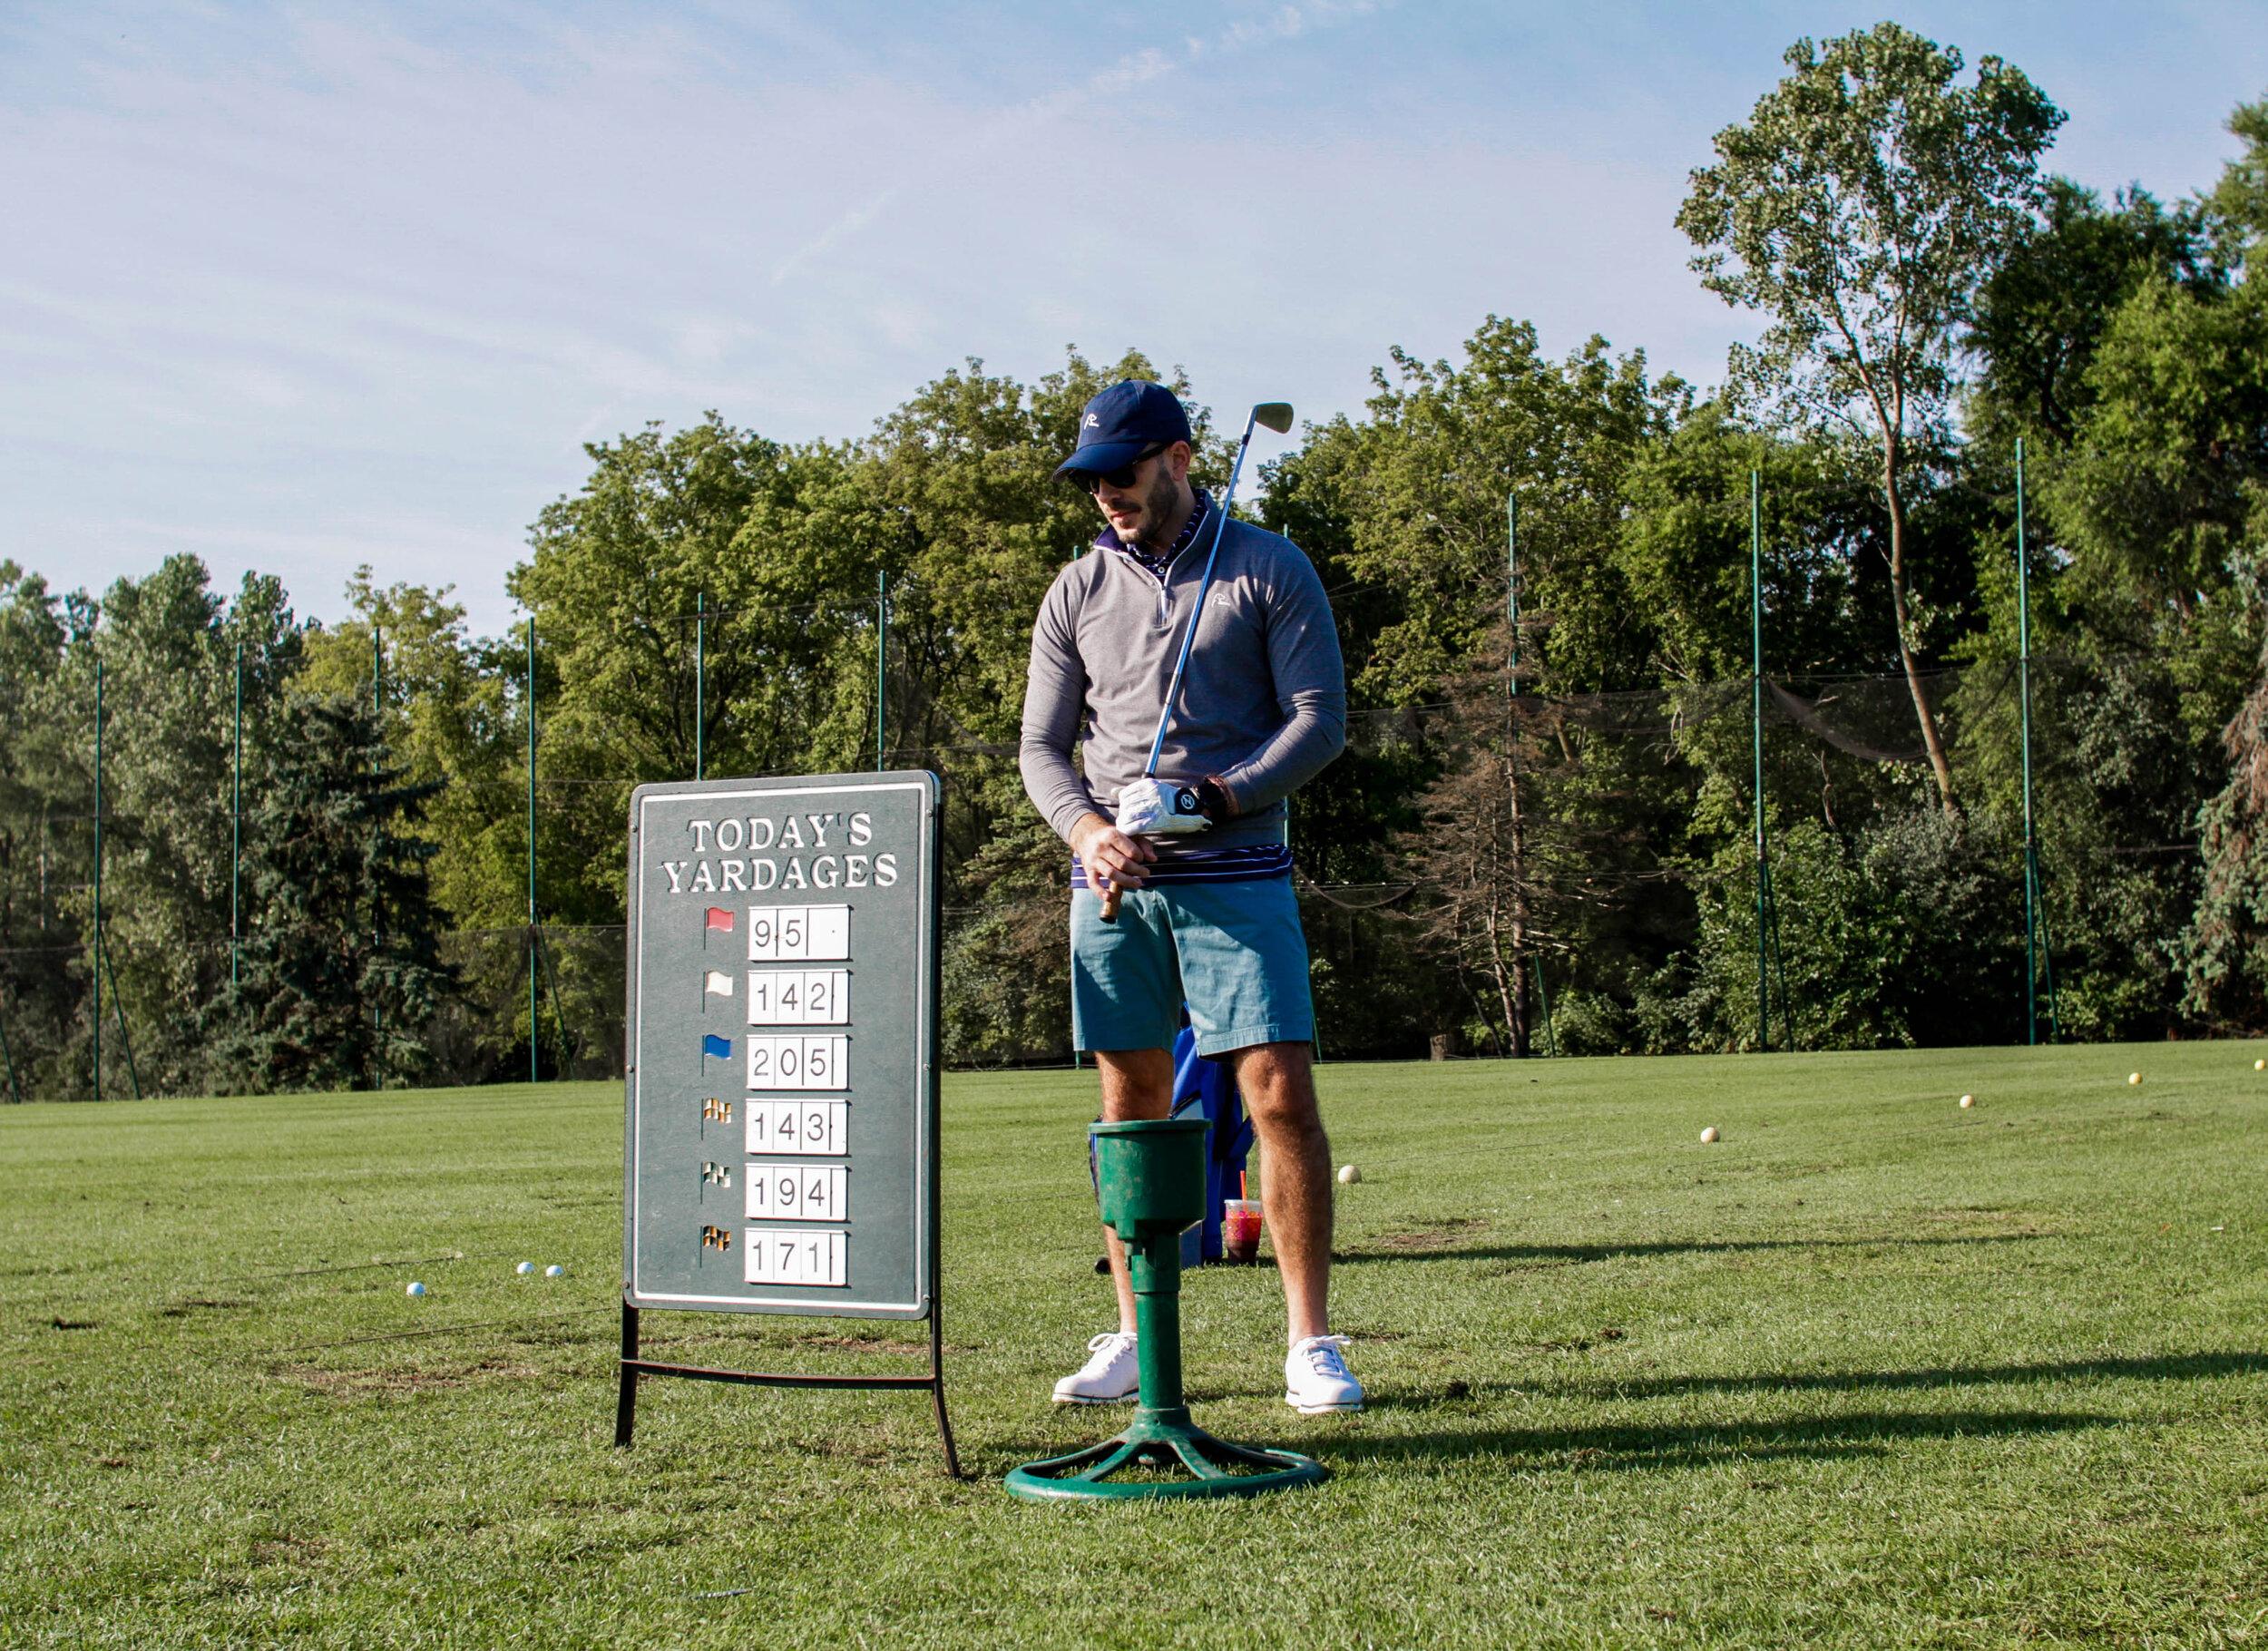 St. Andrews Golf Rage in West Chicago, IL